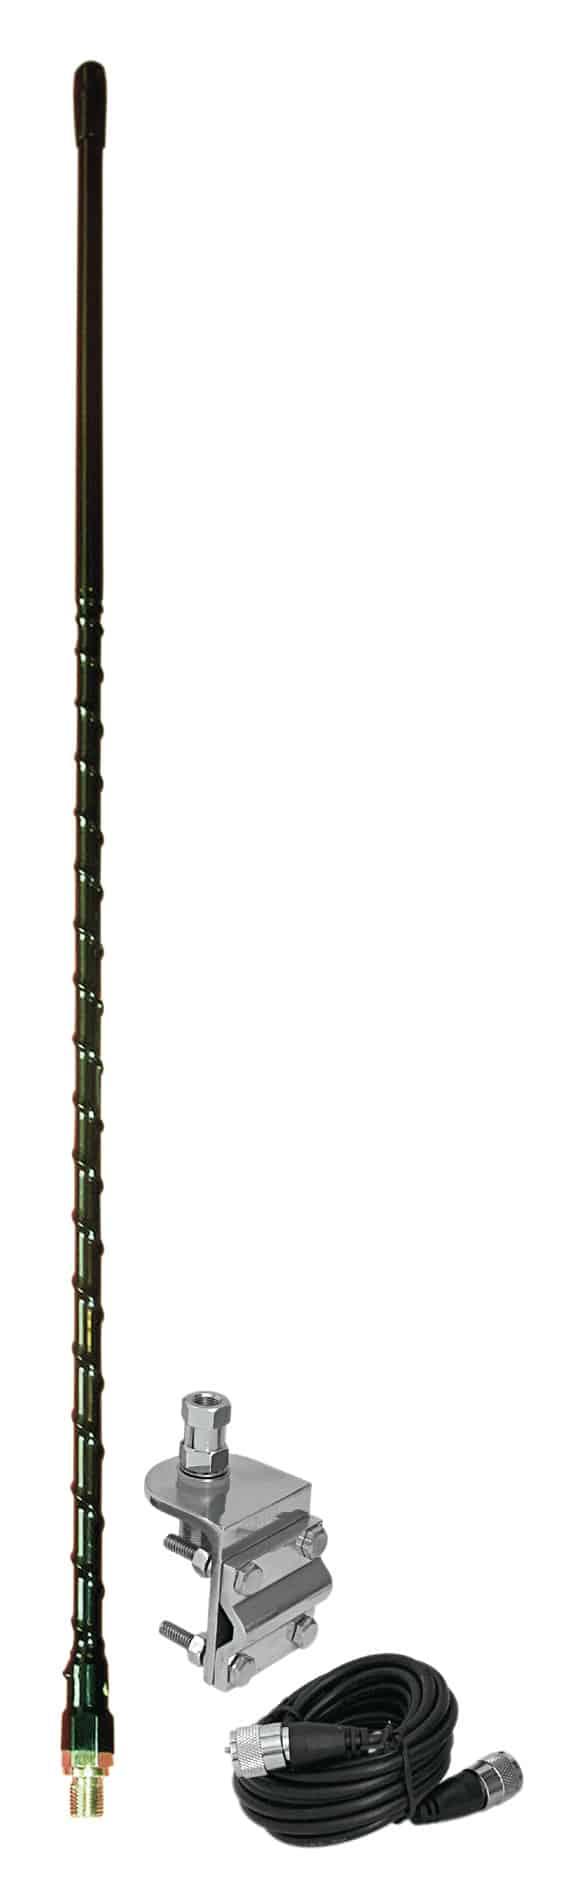 HSS995-2B - ProComm 2' Single Black Antenna Mirror Mount